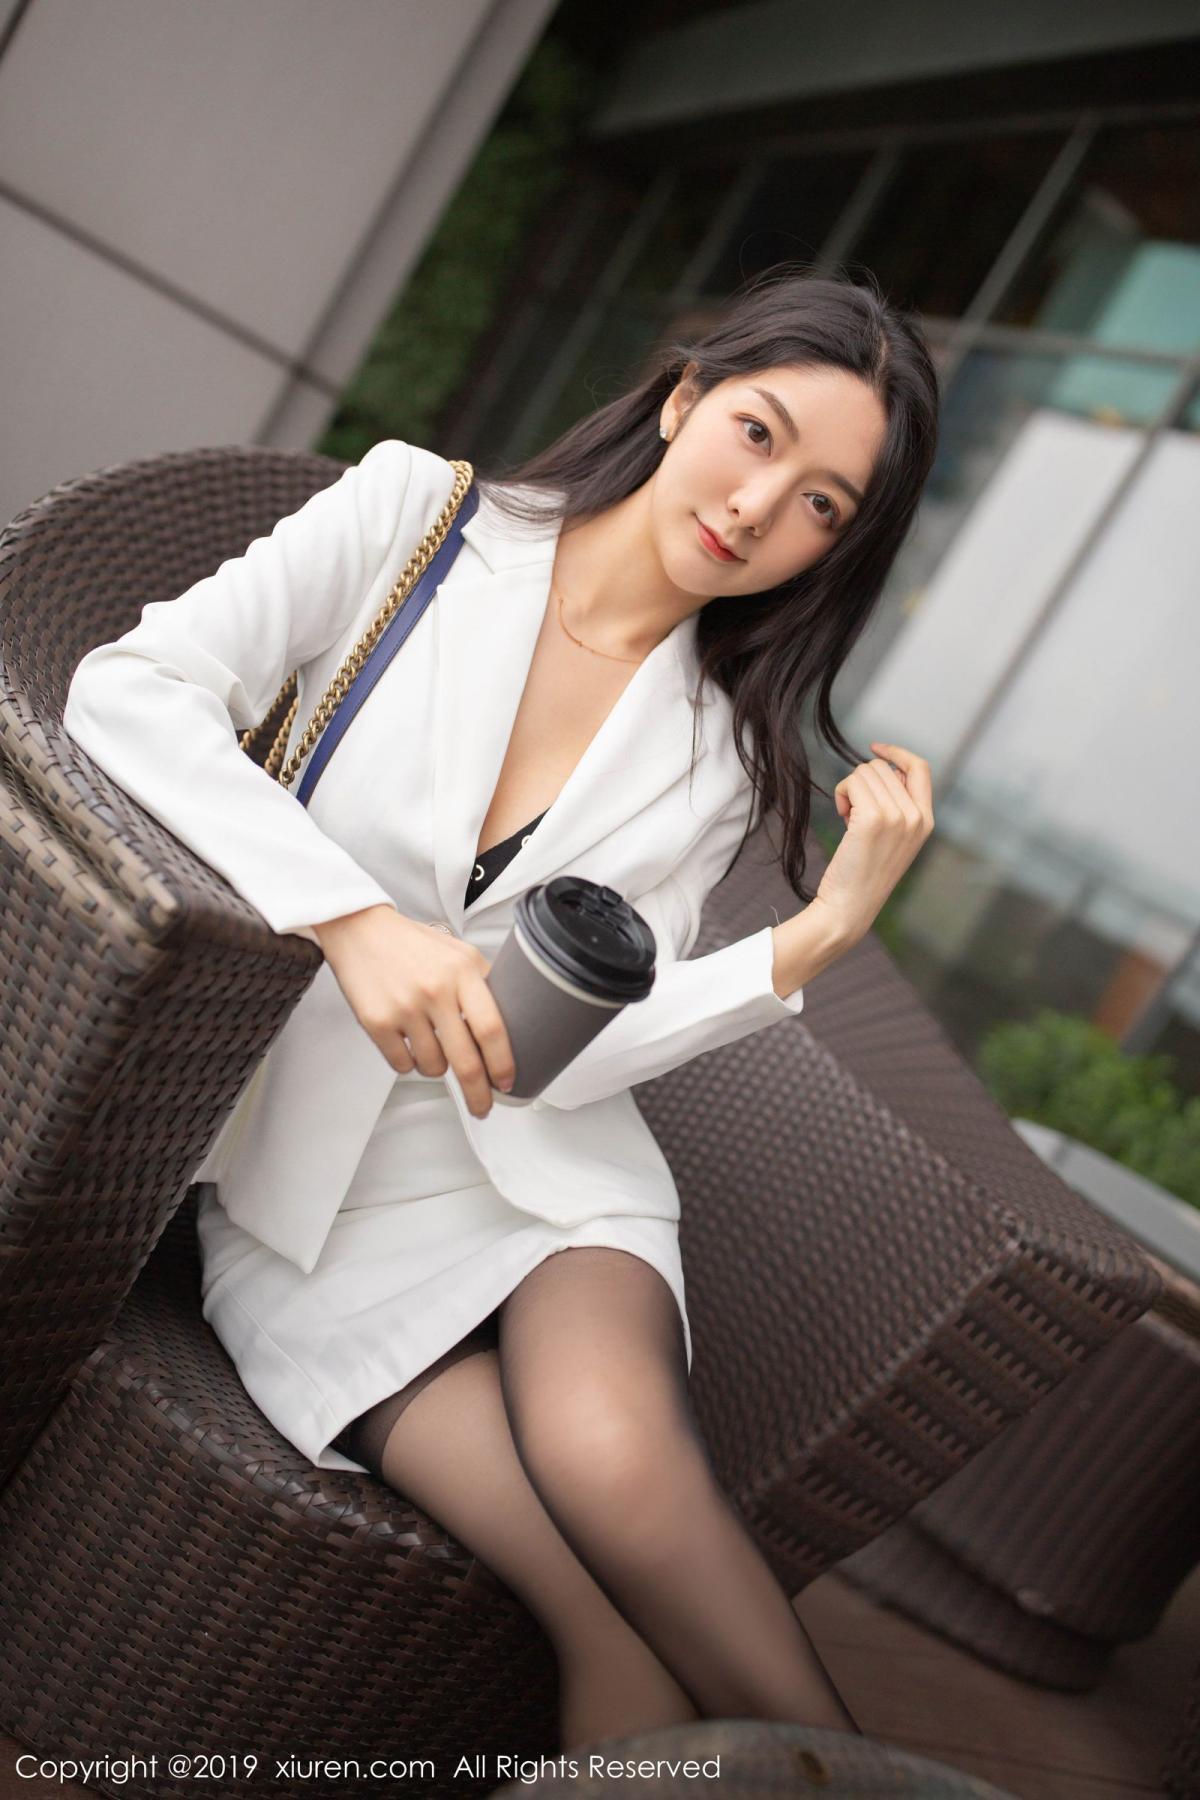 [XiuRen] Vol.1821 Come to my room and sit after you get off work 24P, Black Silk, Di Yi, Xiuren